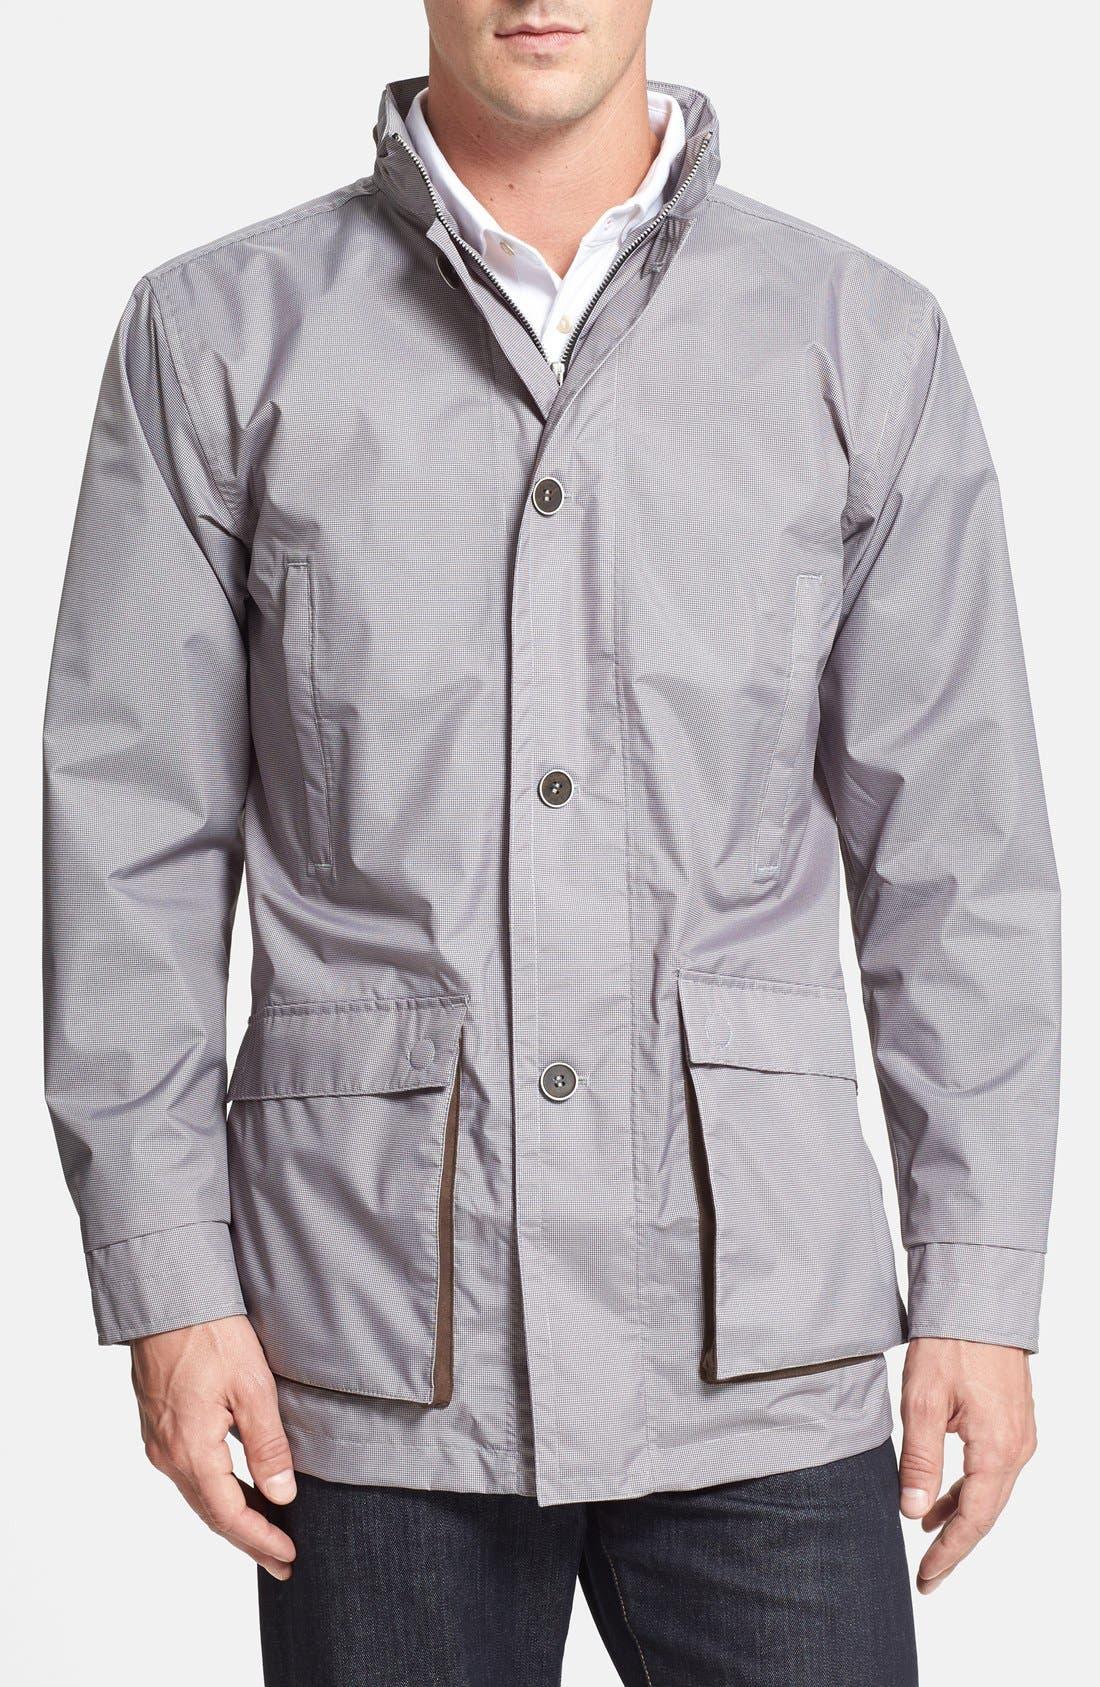 Main Image - Peter Millar 'Newport' Waterproof Full Zip Jacket